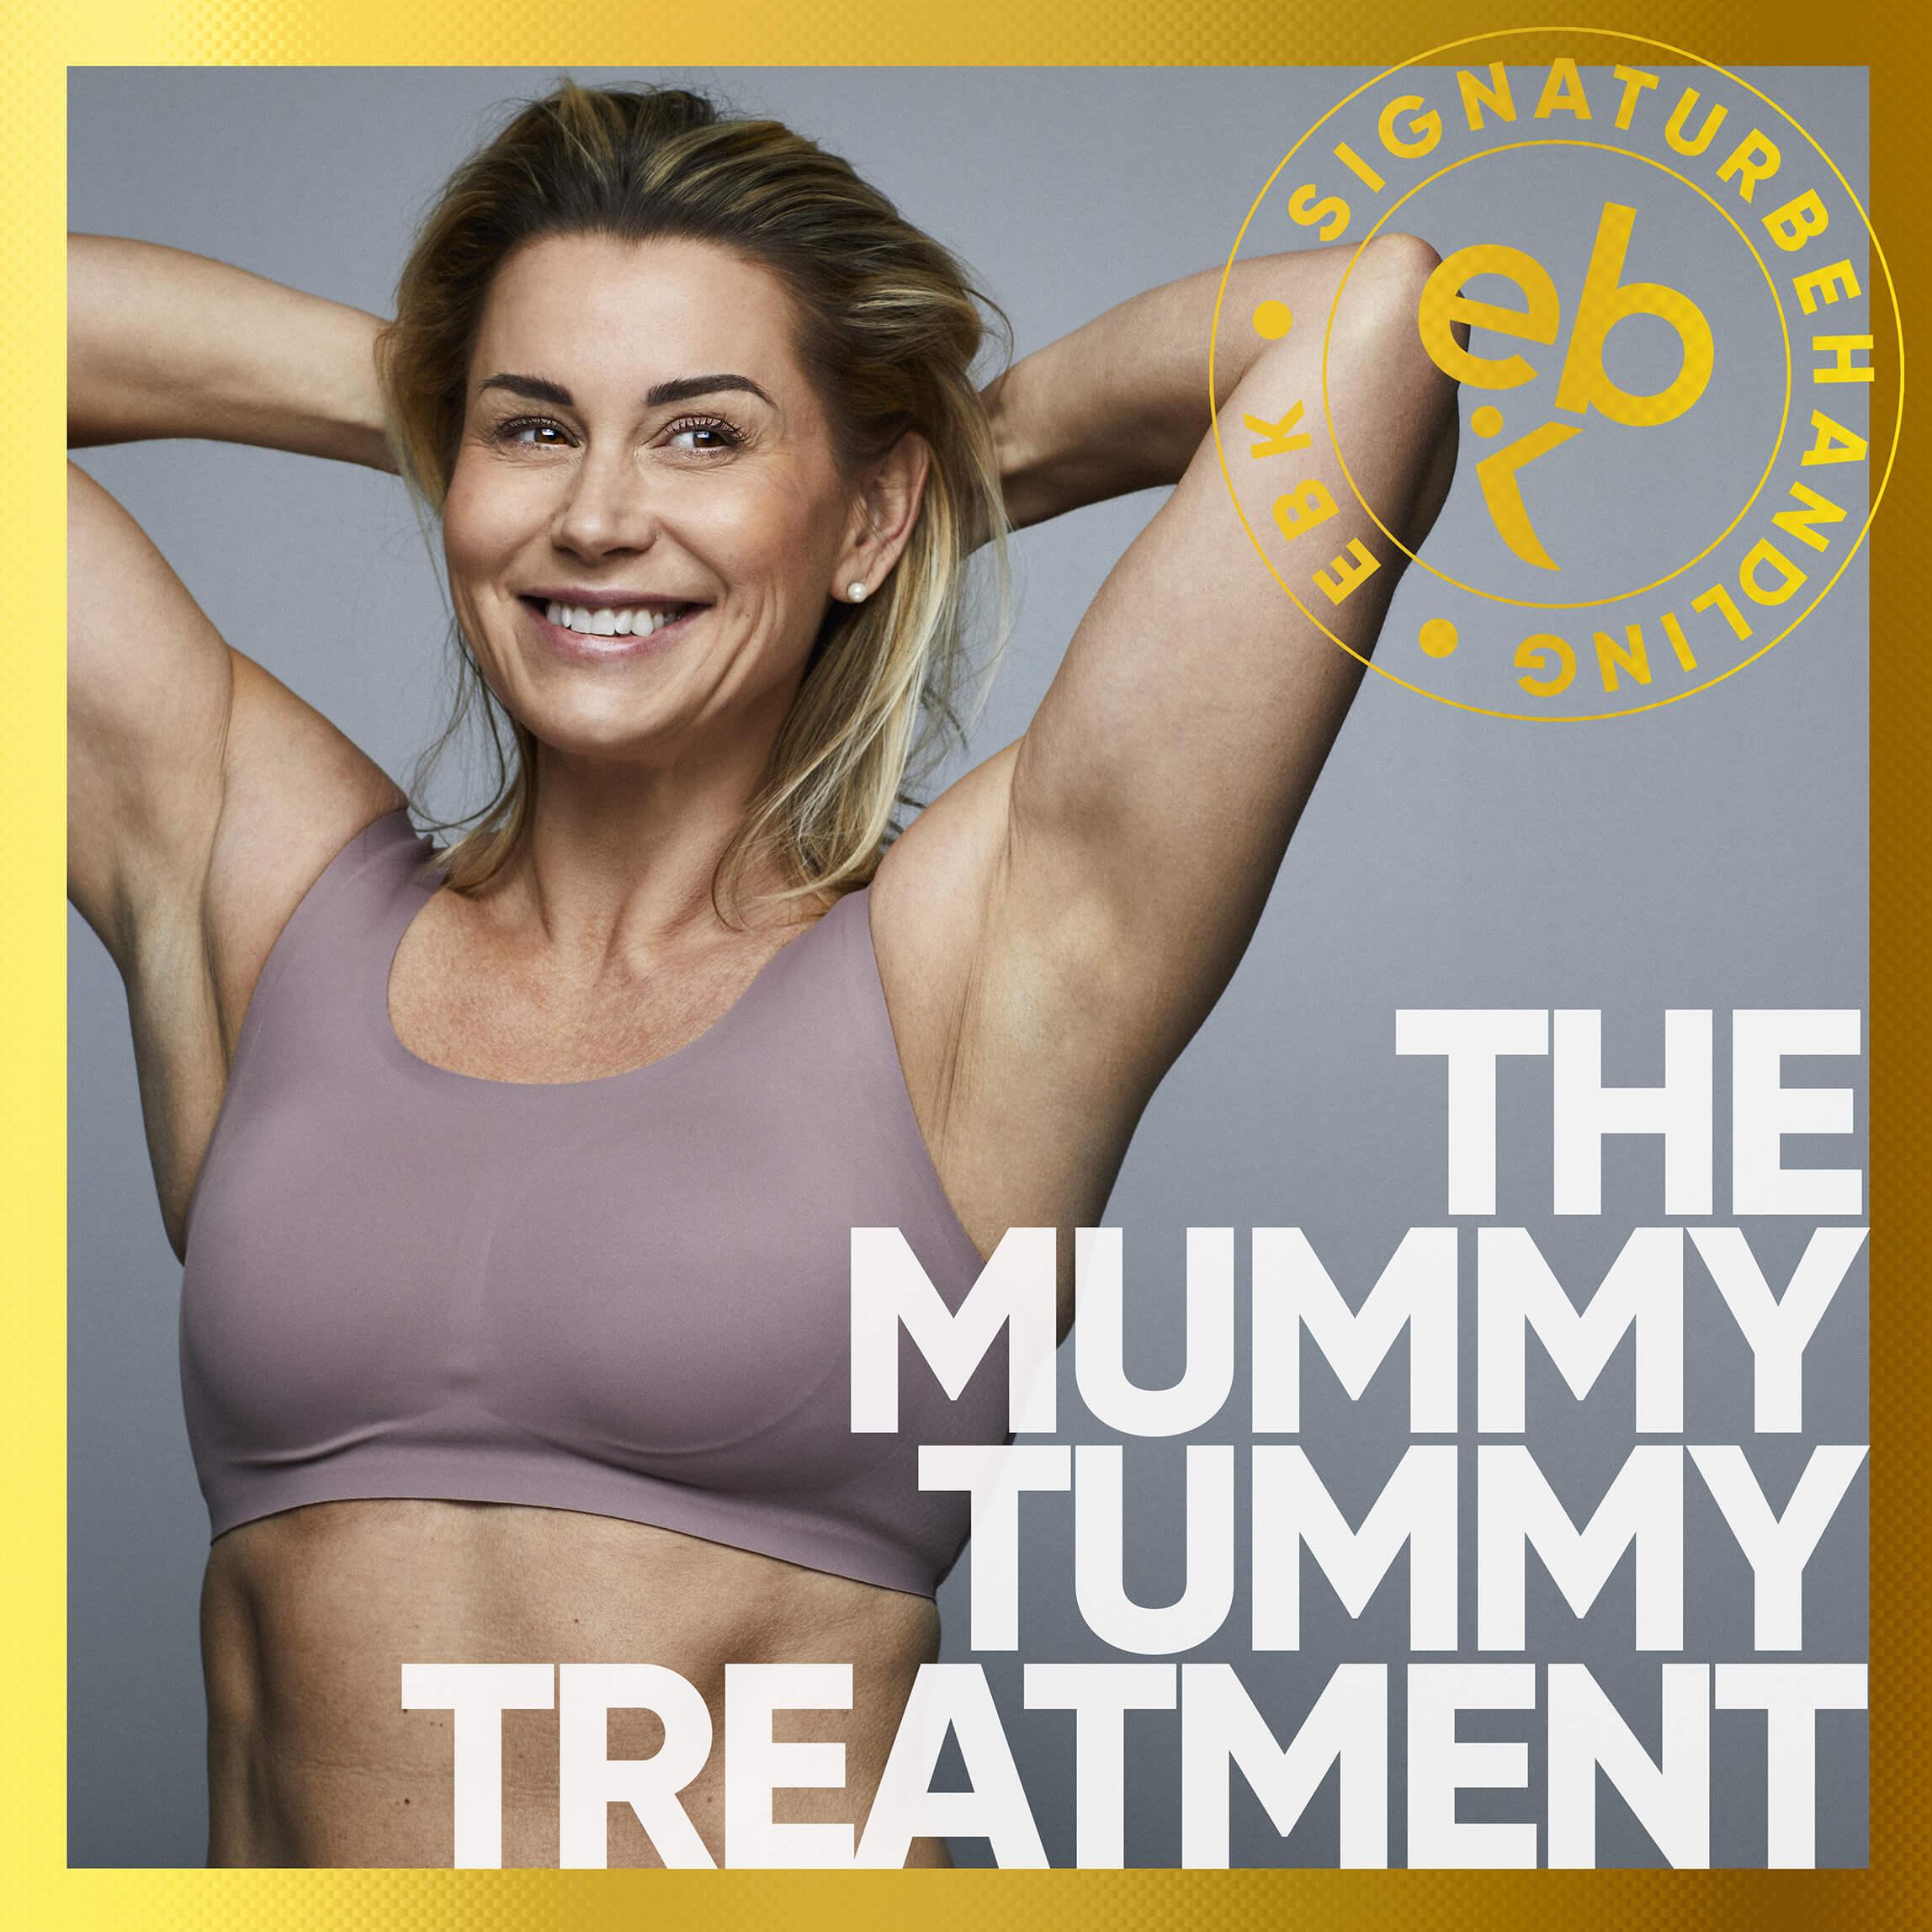 THE MUMMY TUMMY TREATMENT